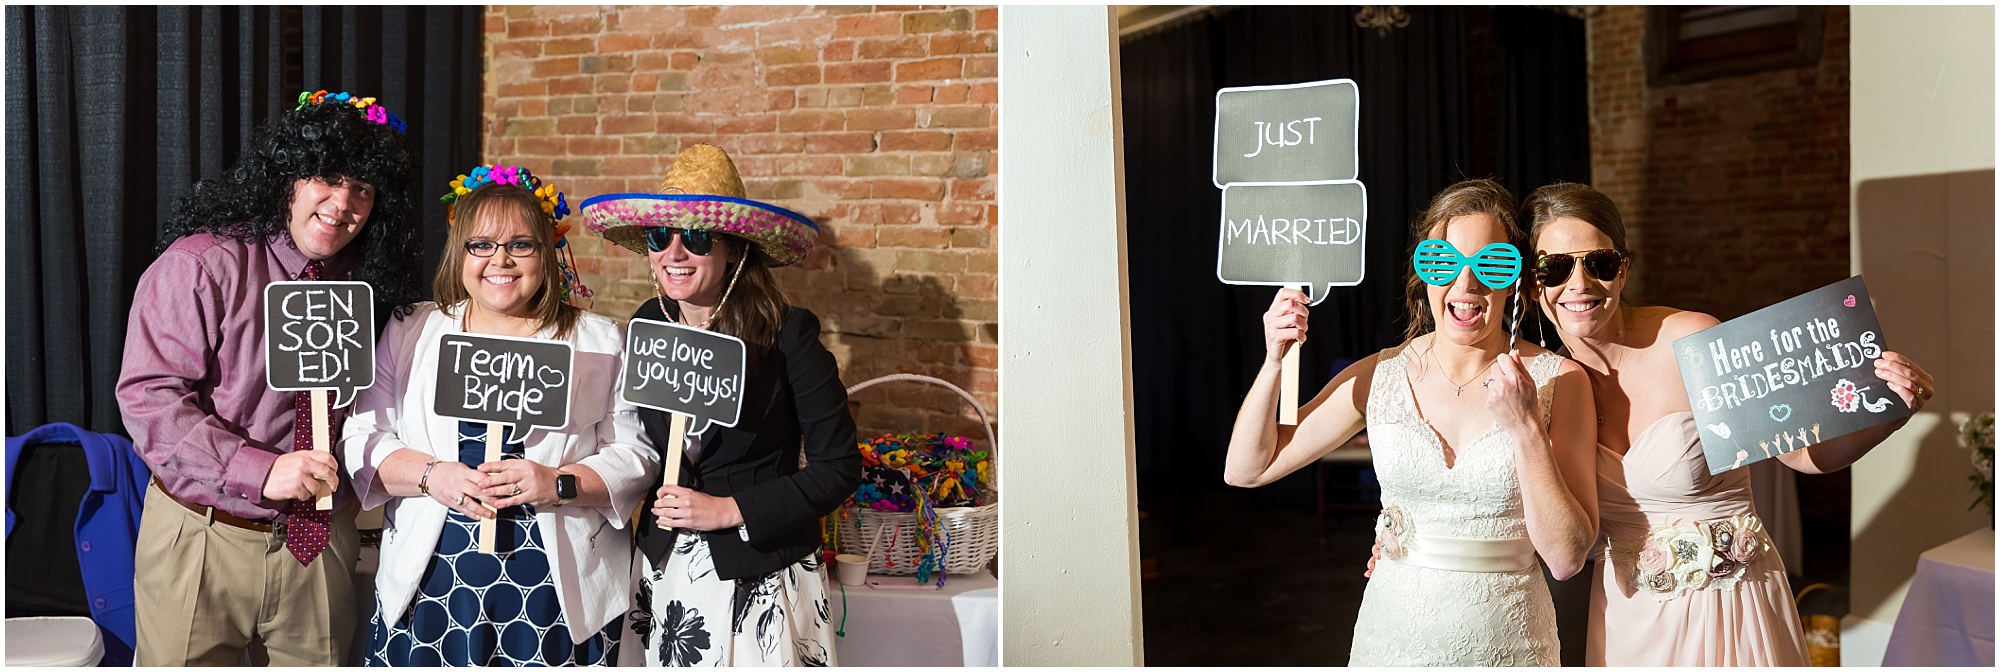 Downtown-Waco-Fall-Wedding_0039.jpg